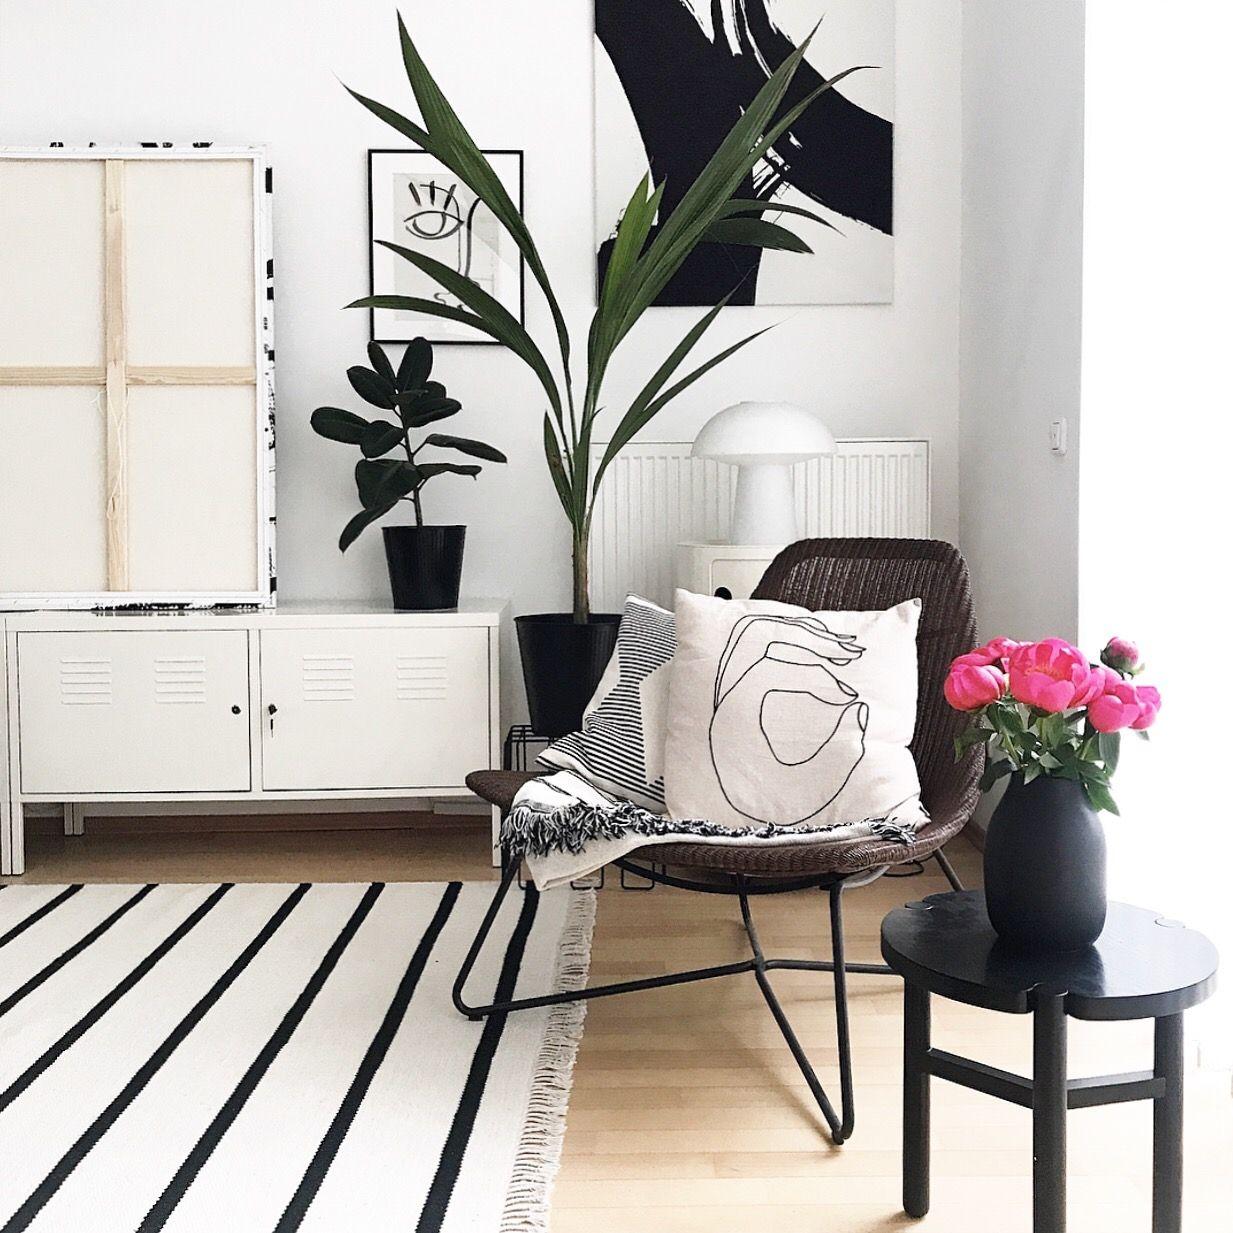 55 Best Living Room Decorating Ideas & Designs